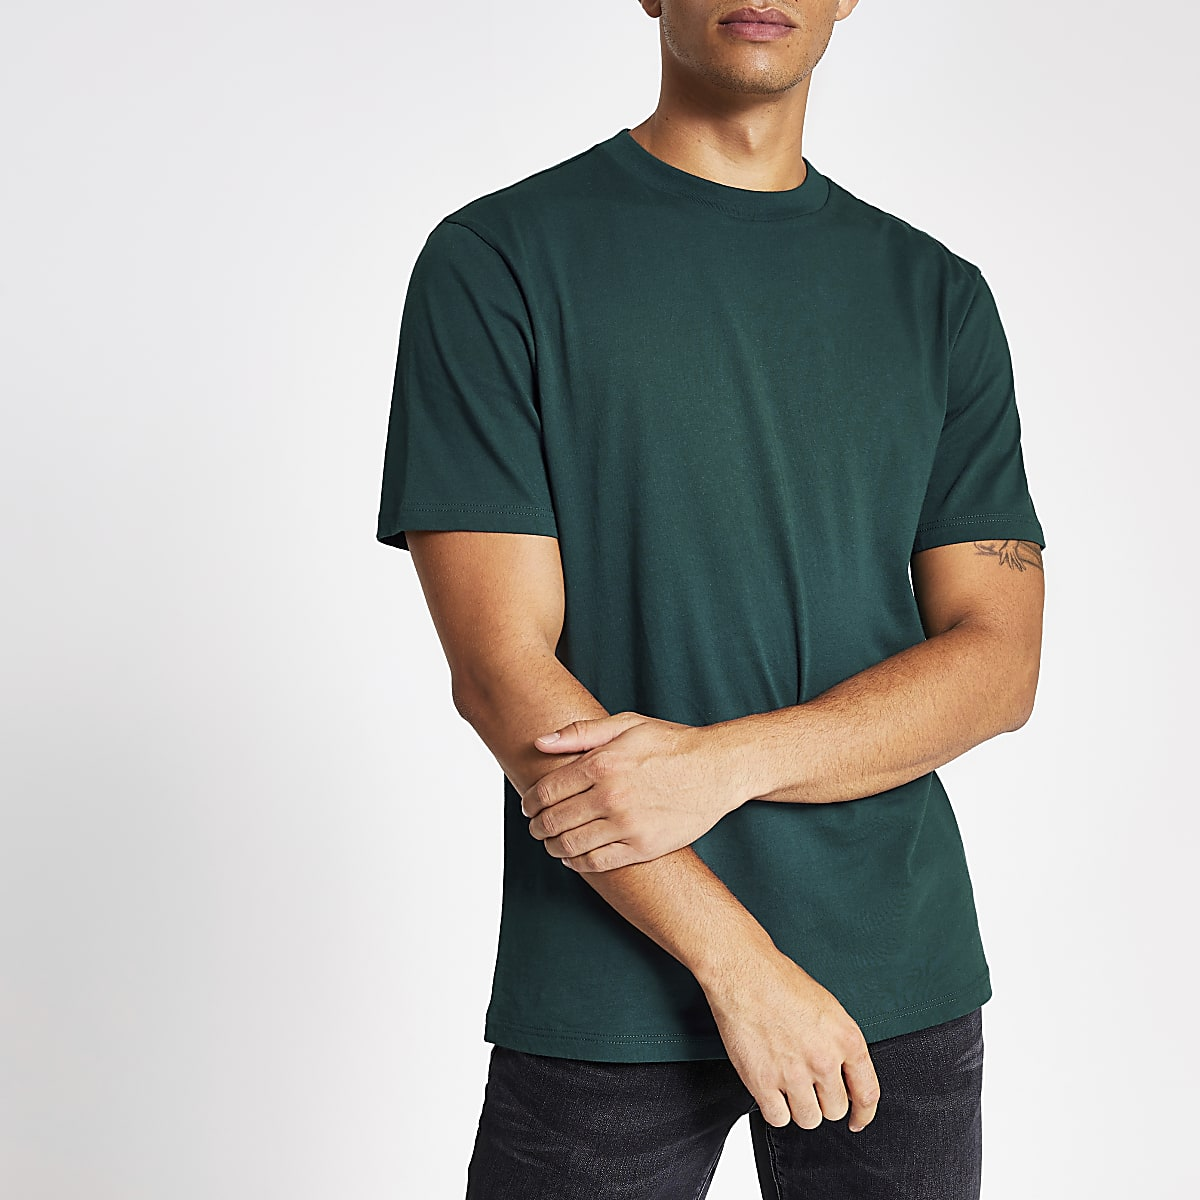 Dark teal regular fit short sleeve T-shirt